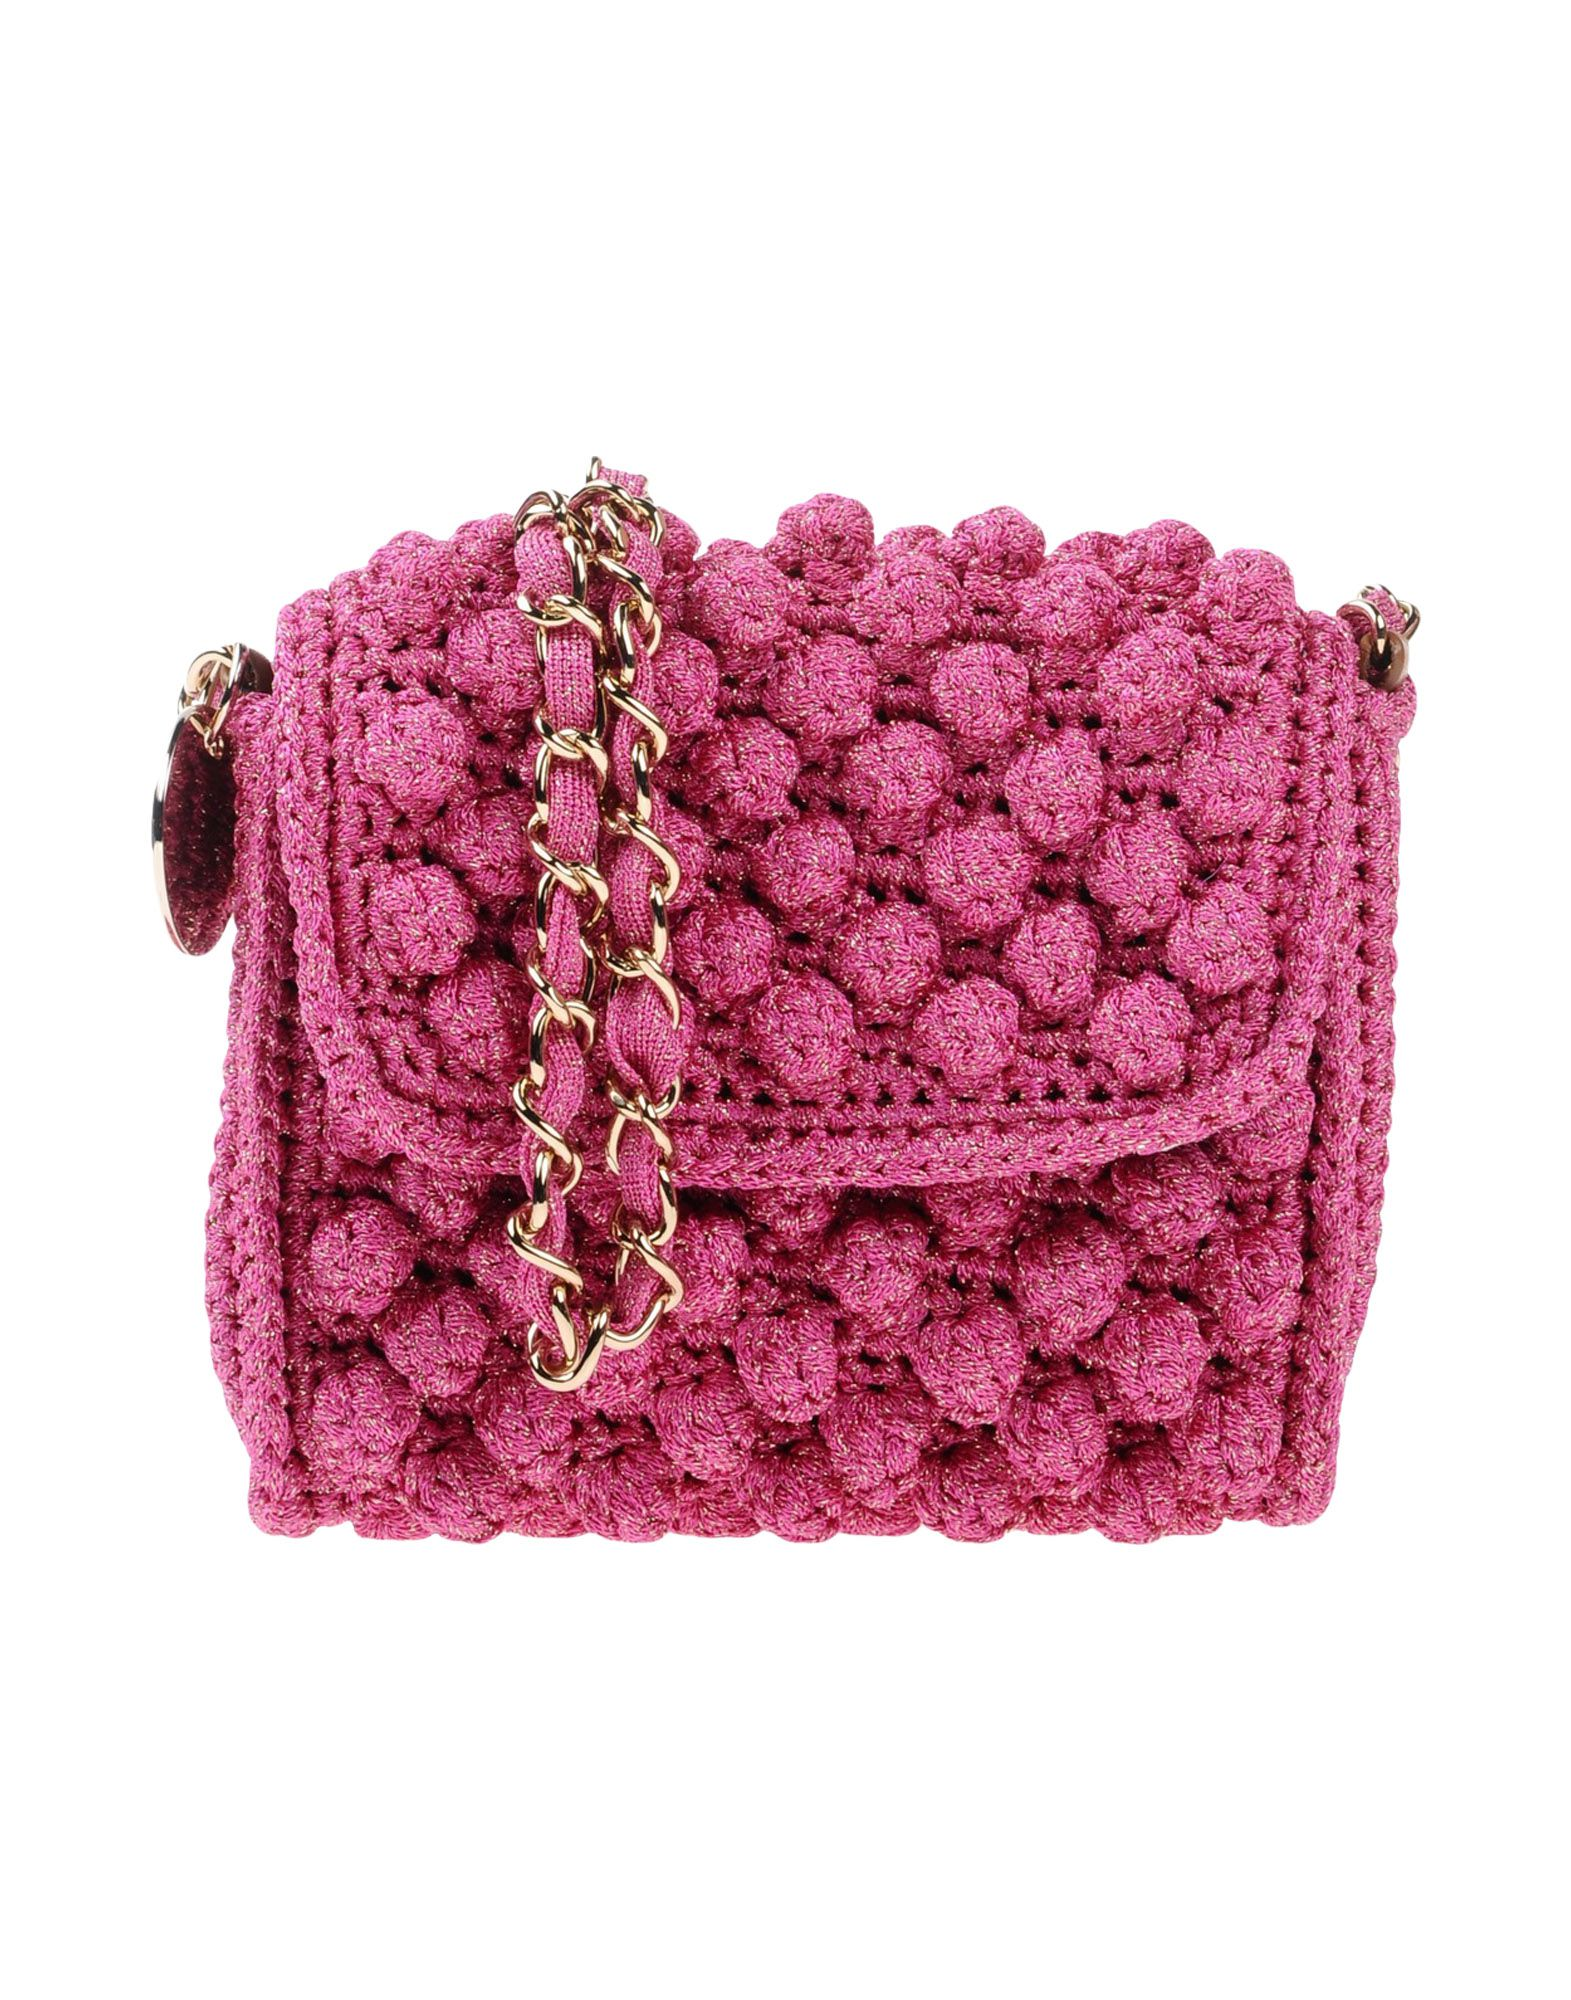 M Missoni Handbags In Garnet